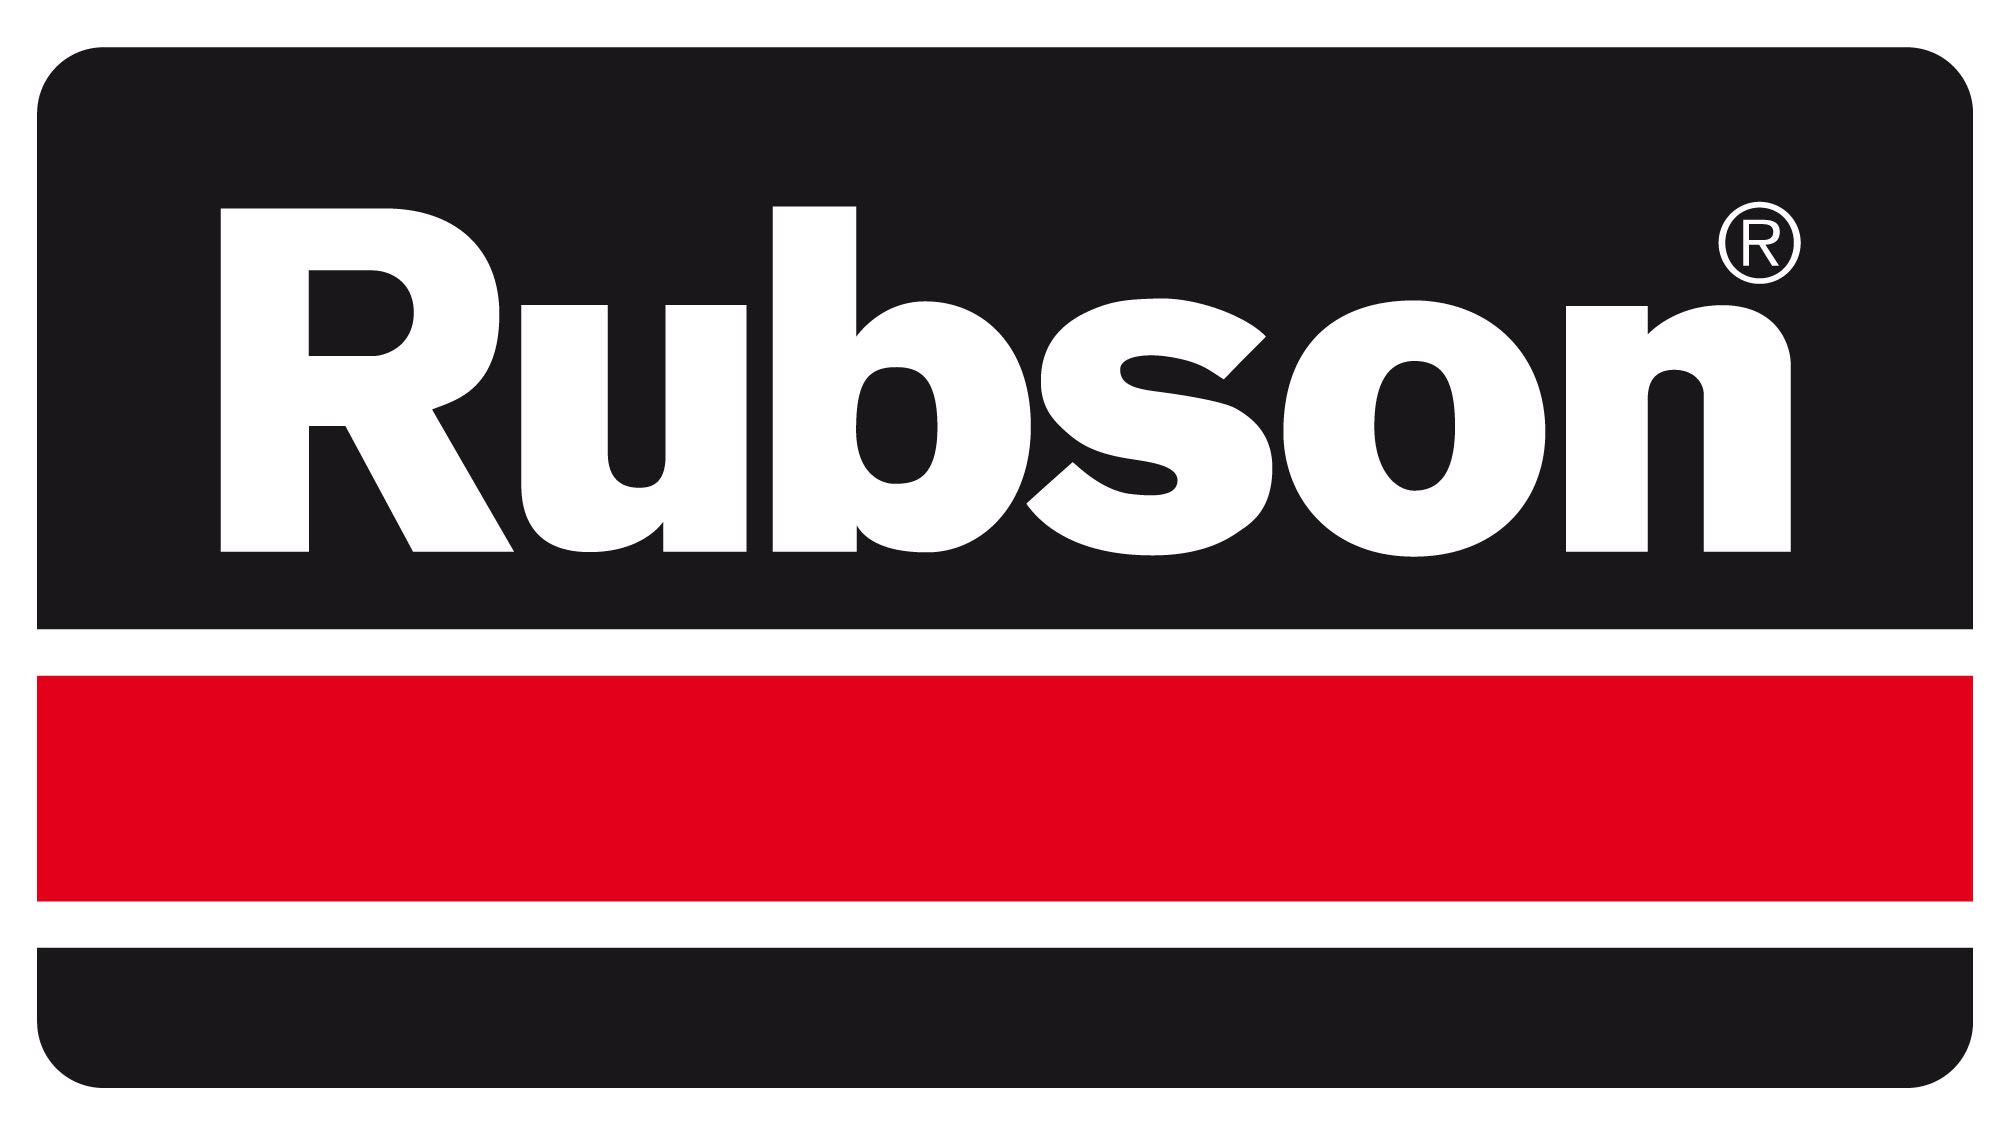 LOGO-RUBSON-CMJN.jpg